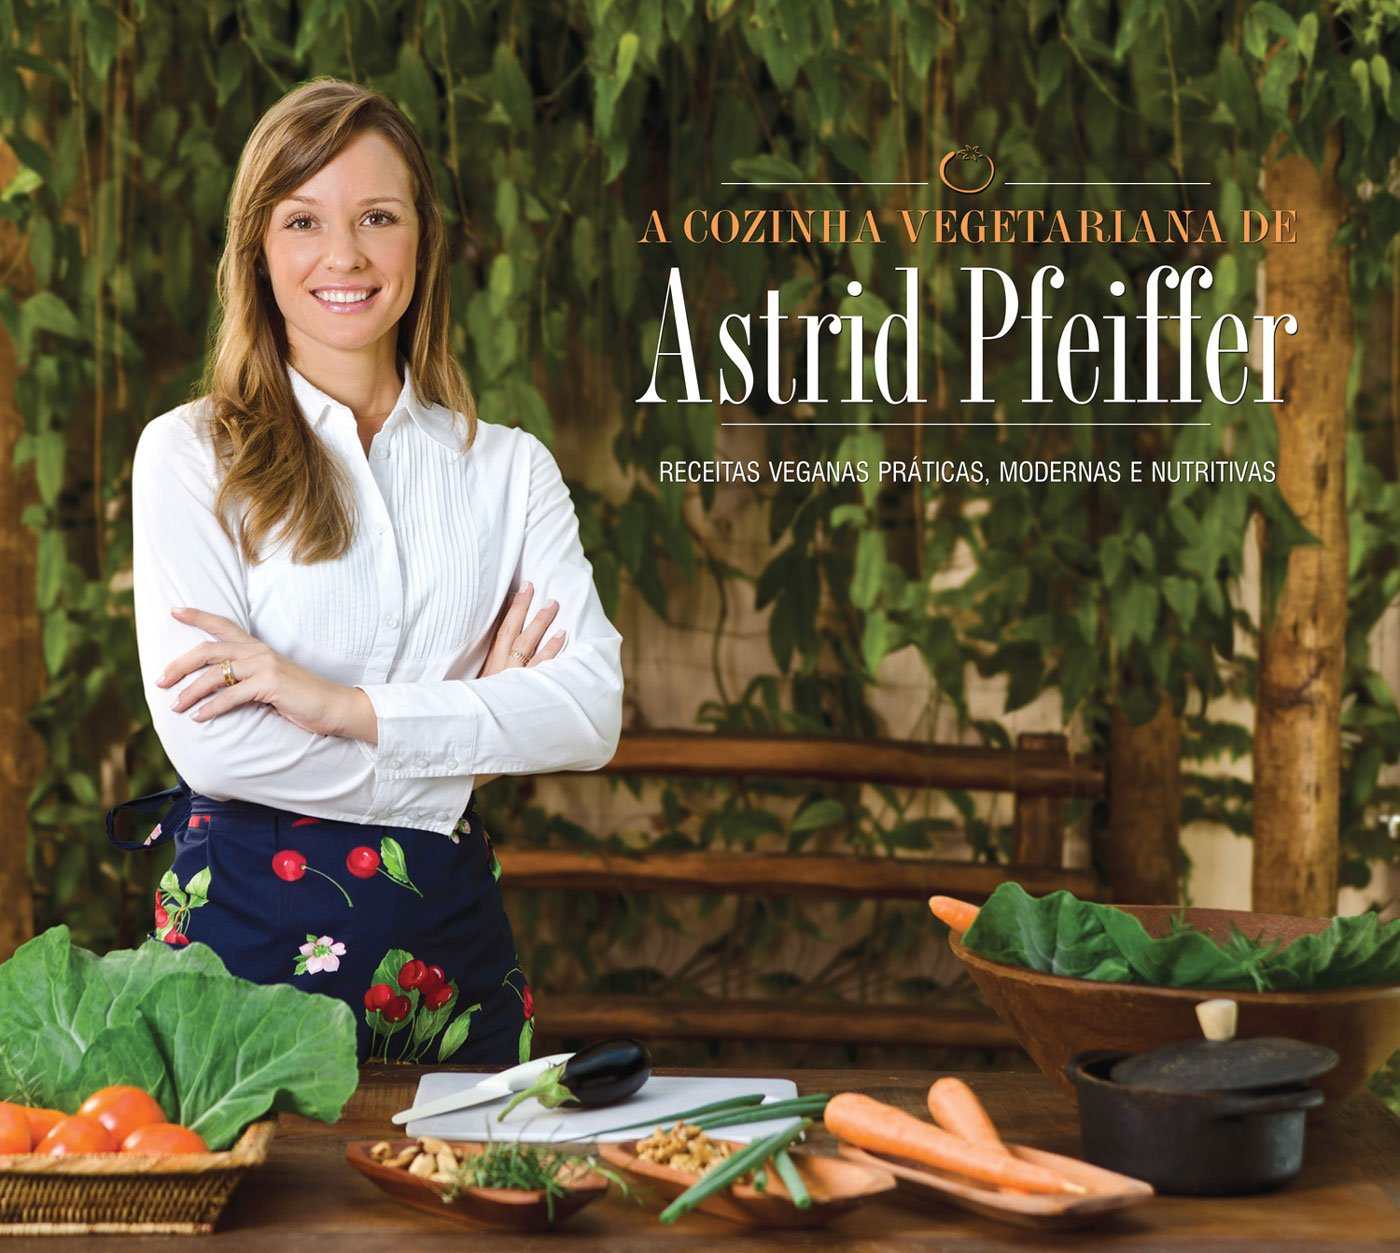 A cozinha vegetariana da Astrid Pfeiffer